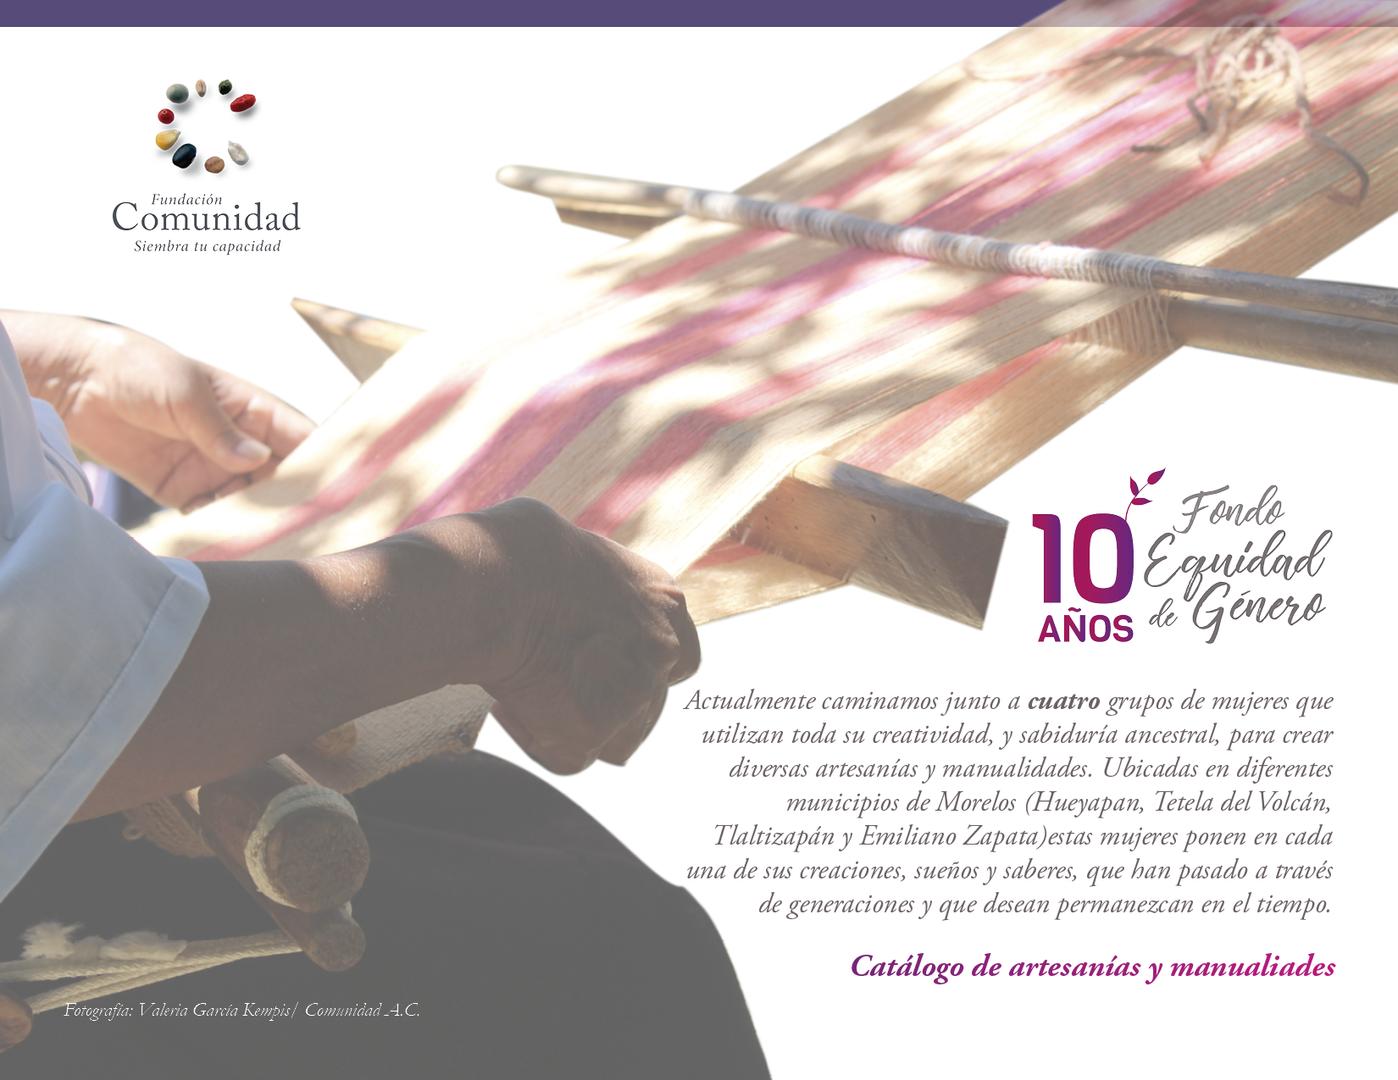 Catalogo artesanias y manualidades.png